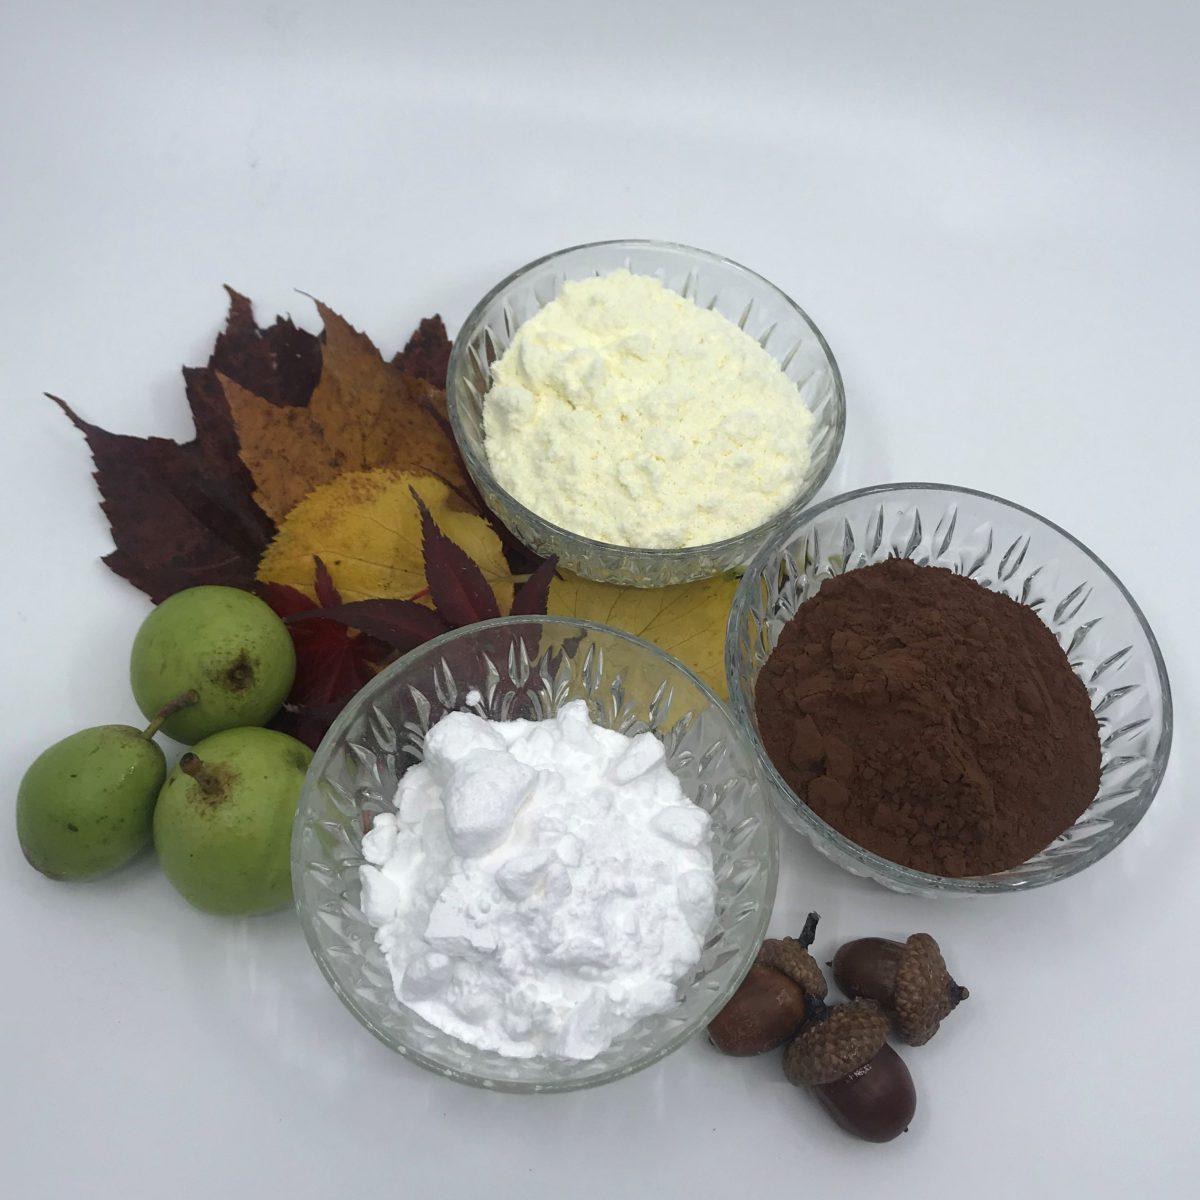 chocomelk mix croped